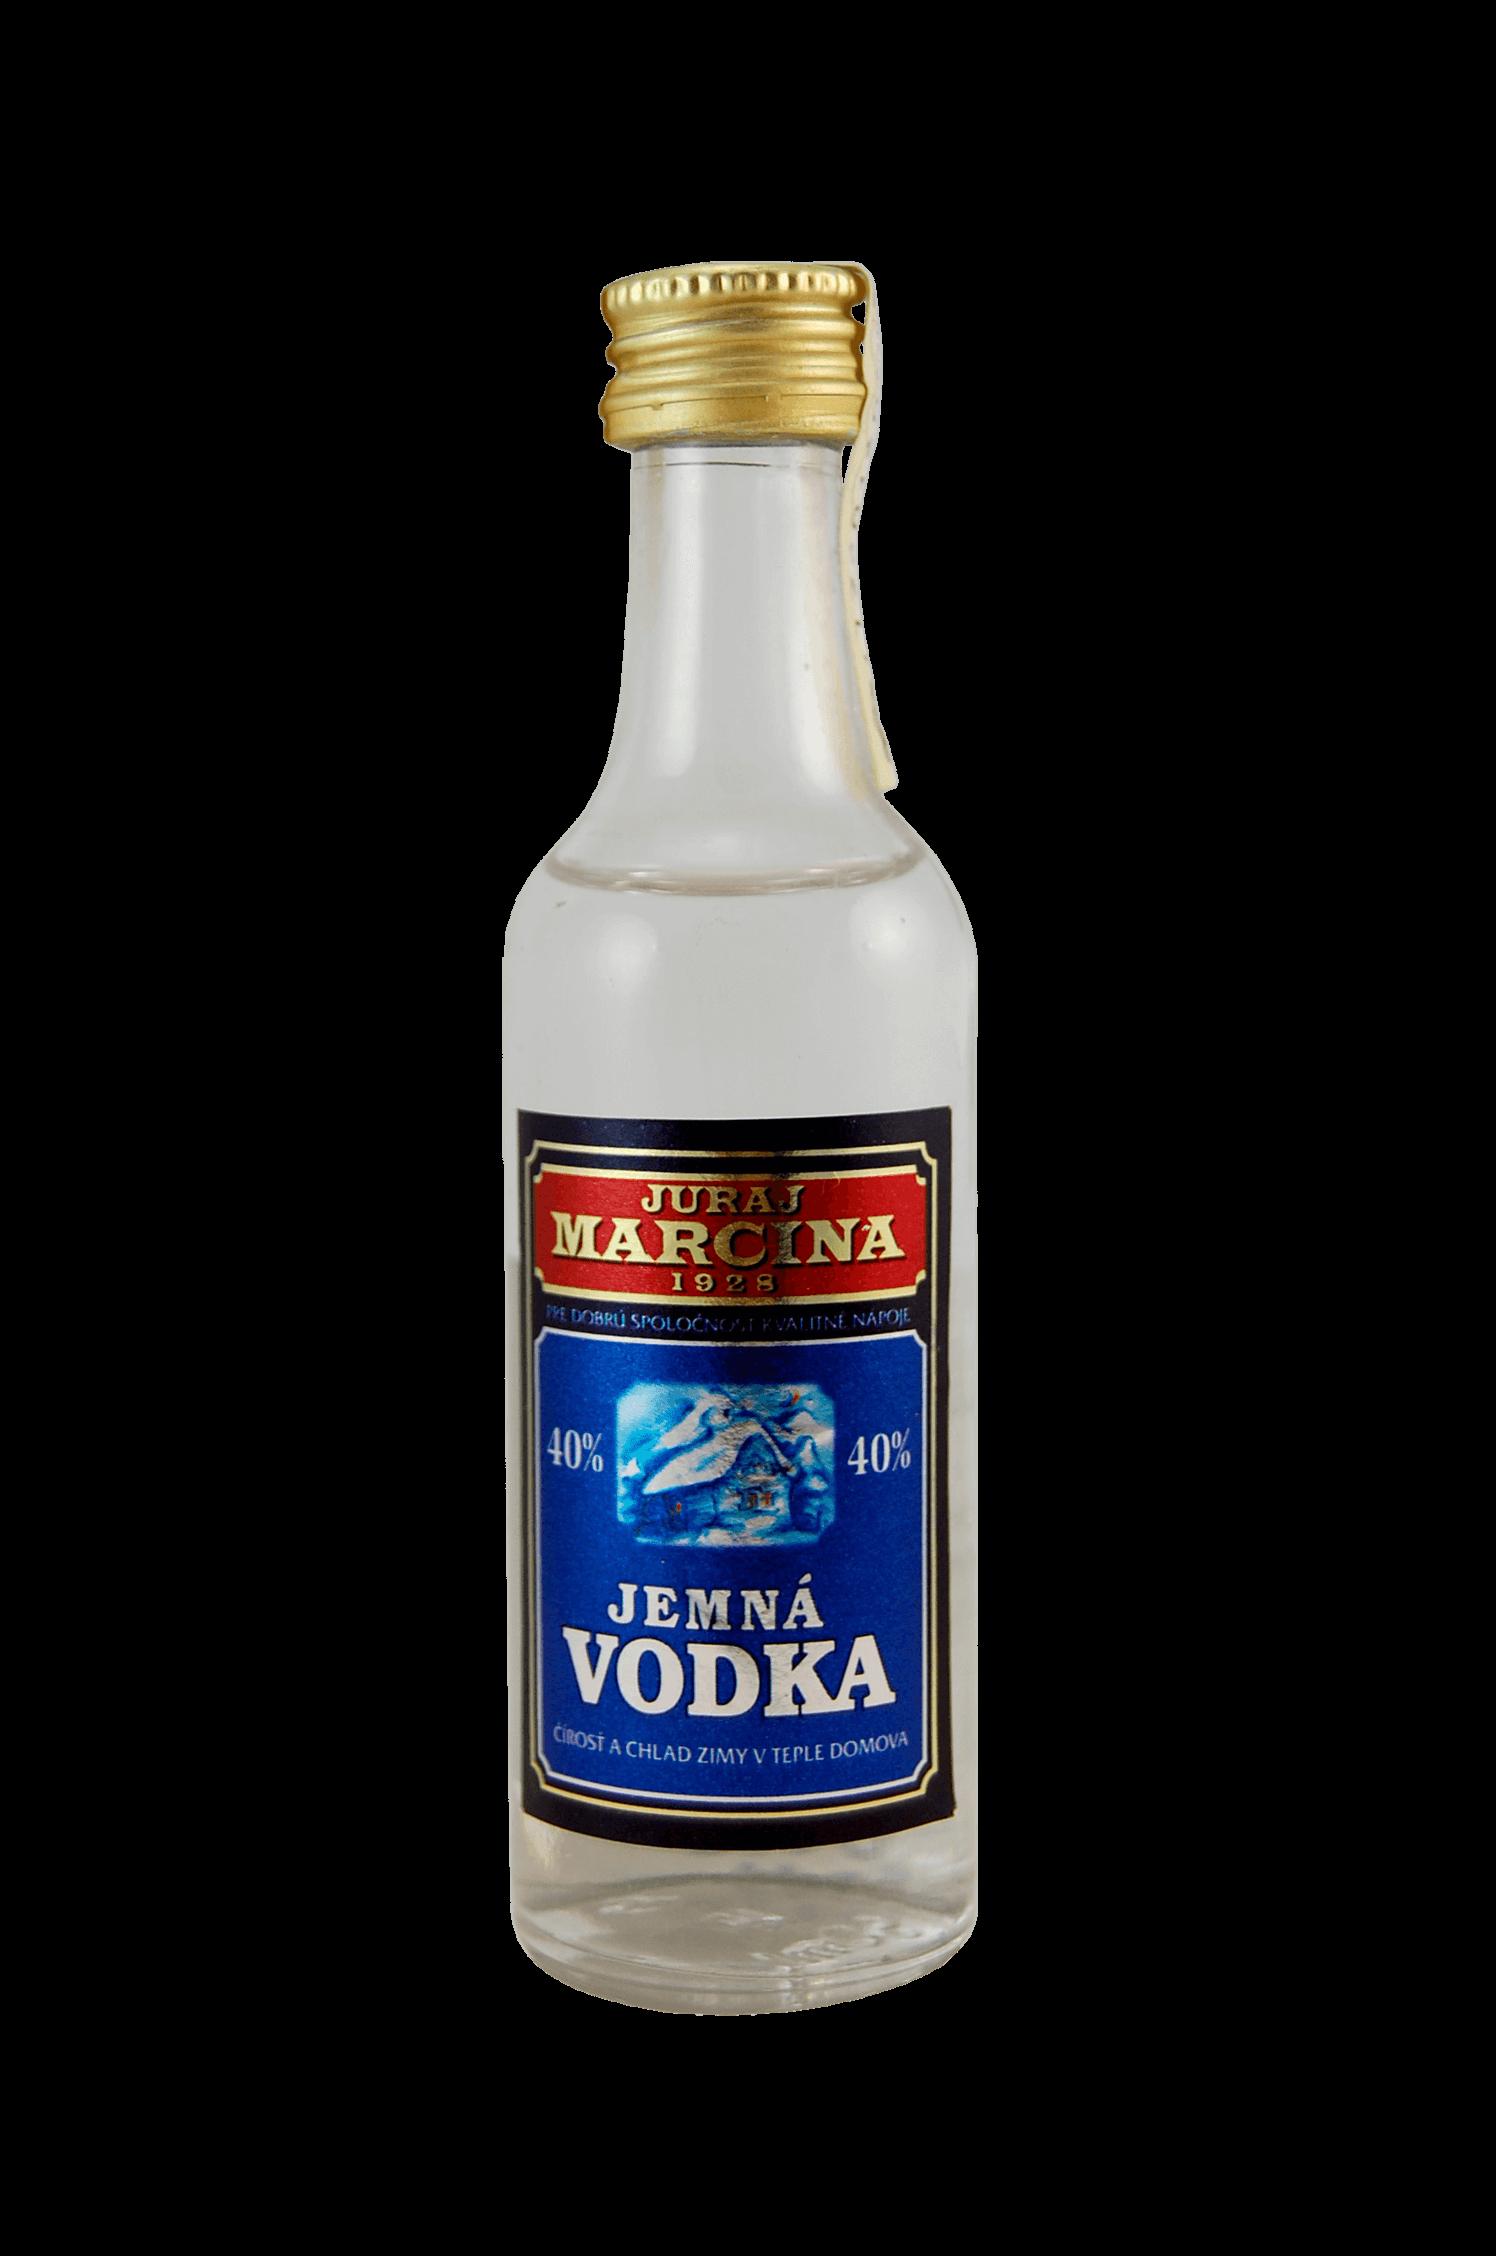 Jemná Vodka J. Marcina